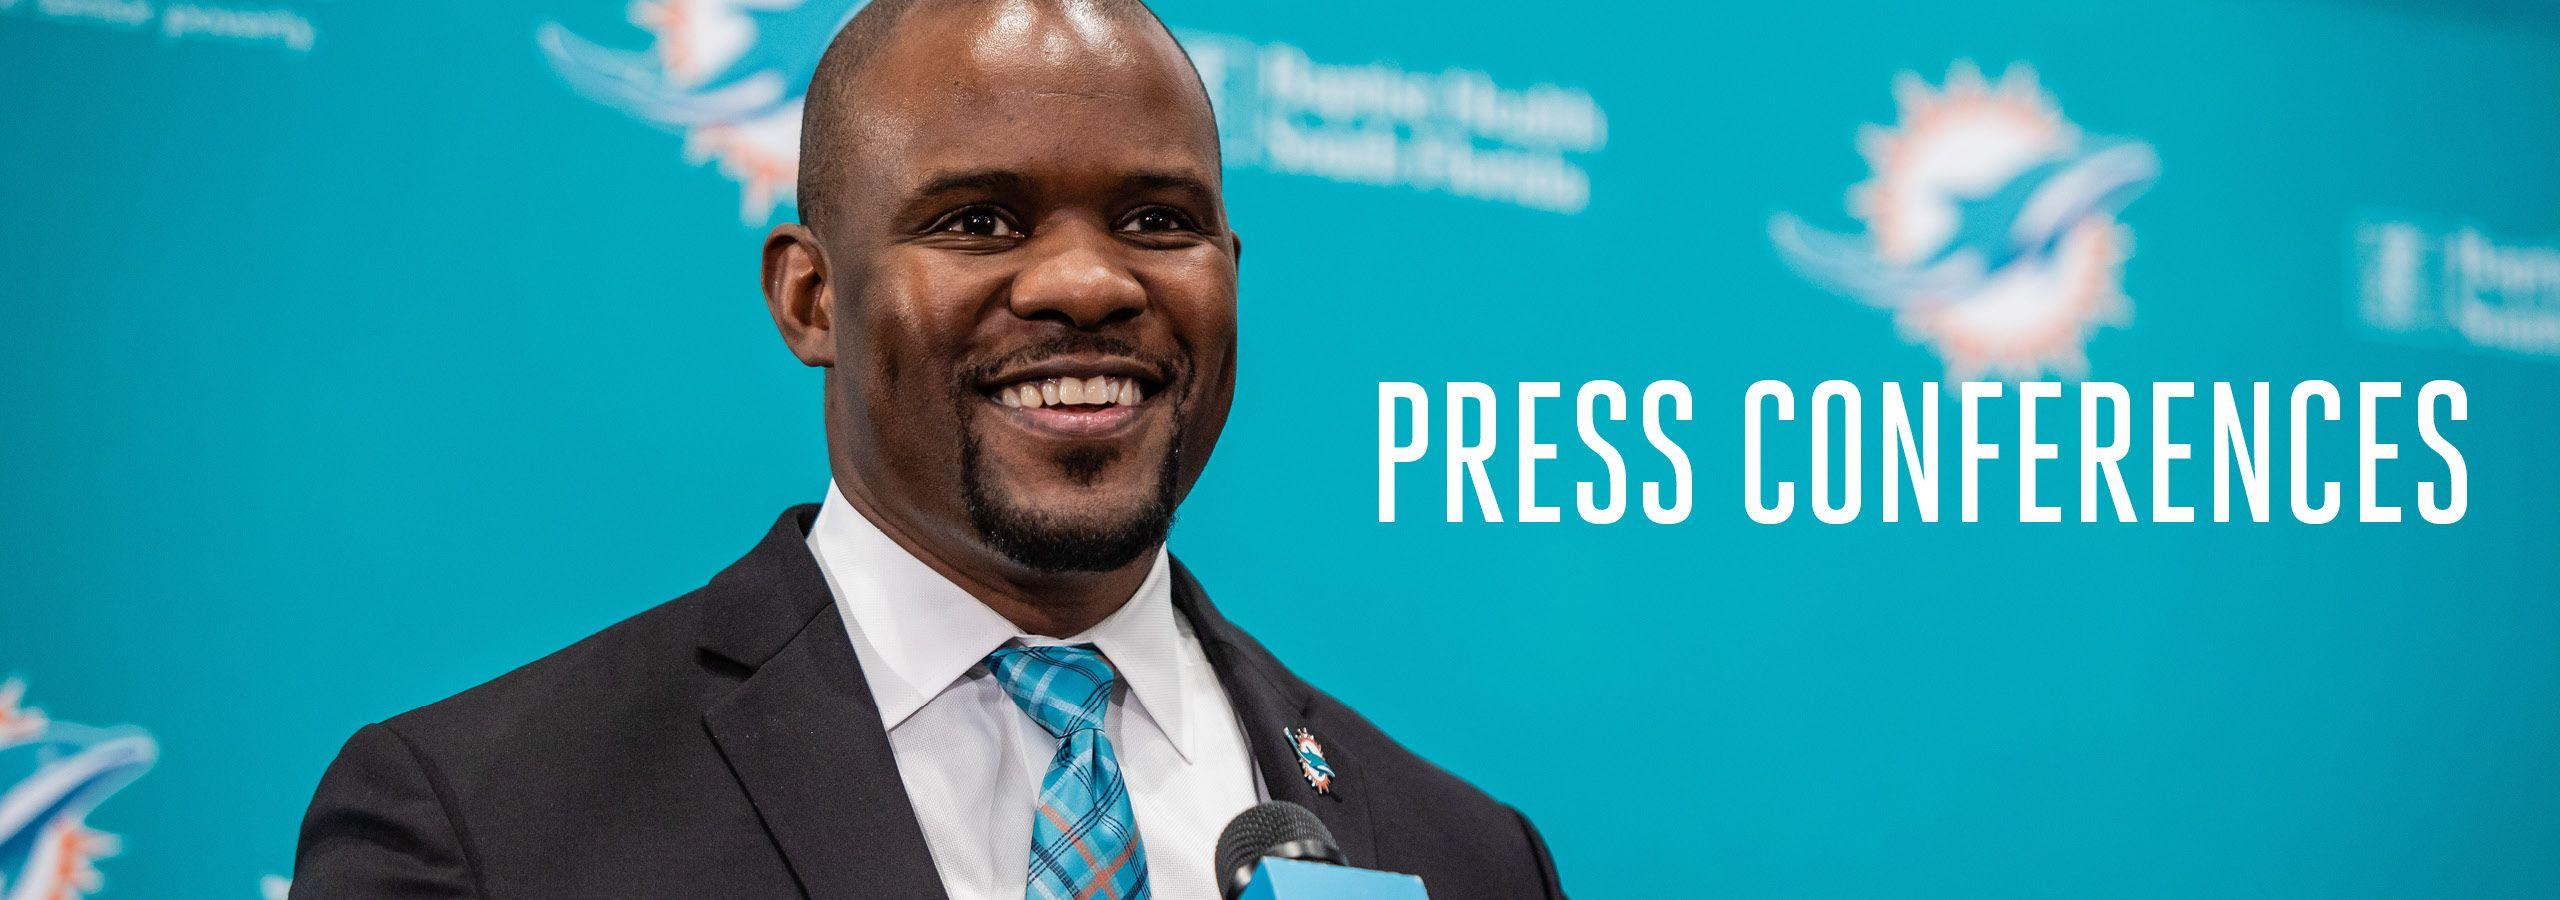 Graphic: Header - Miami Dolphins Press Conferences